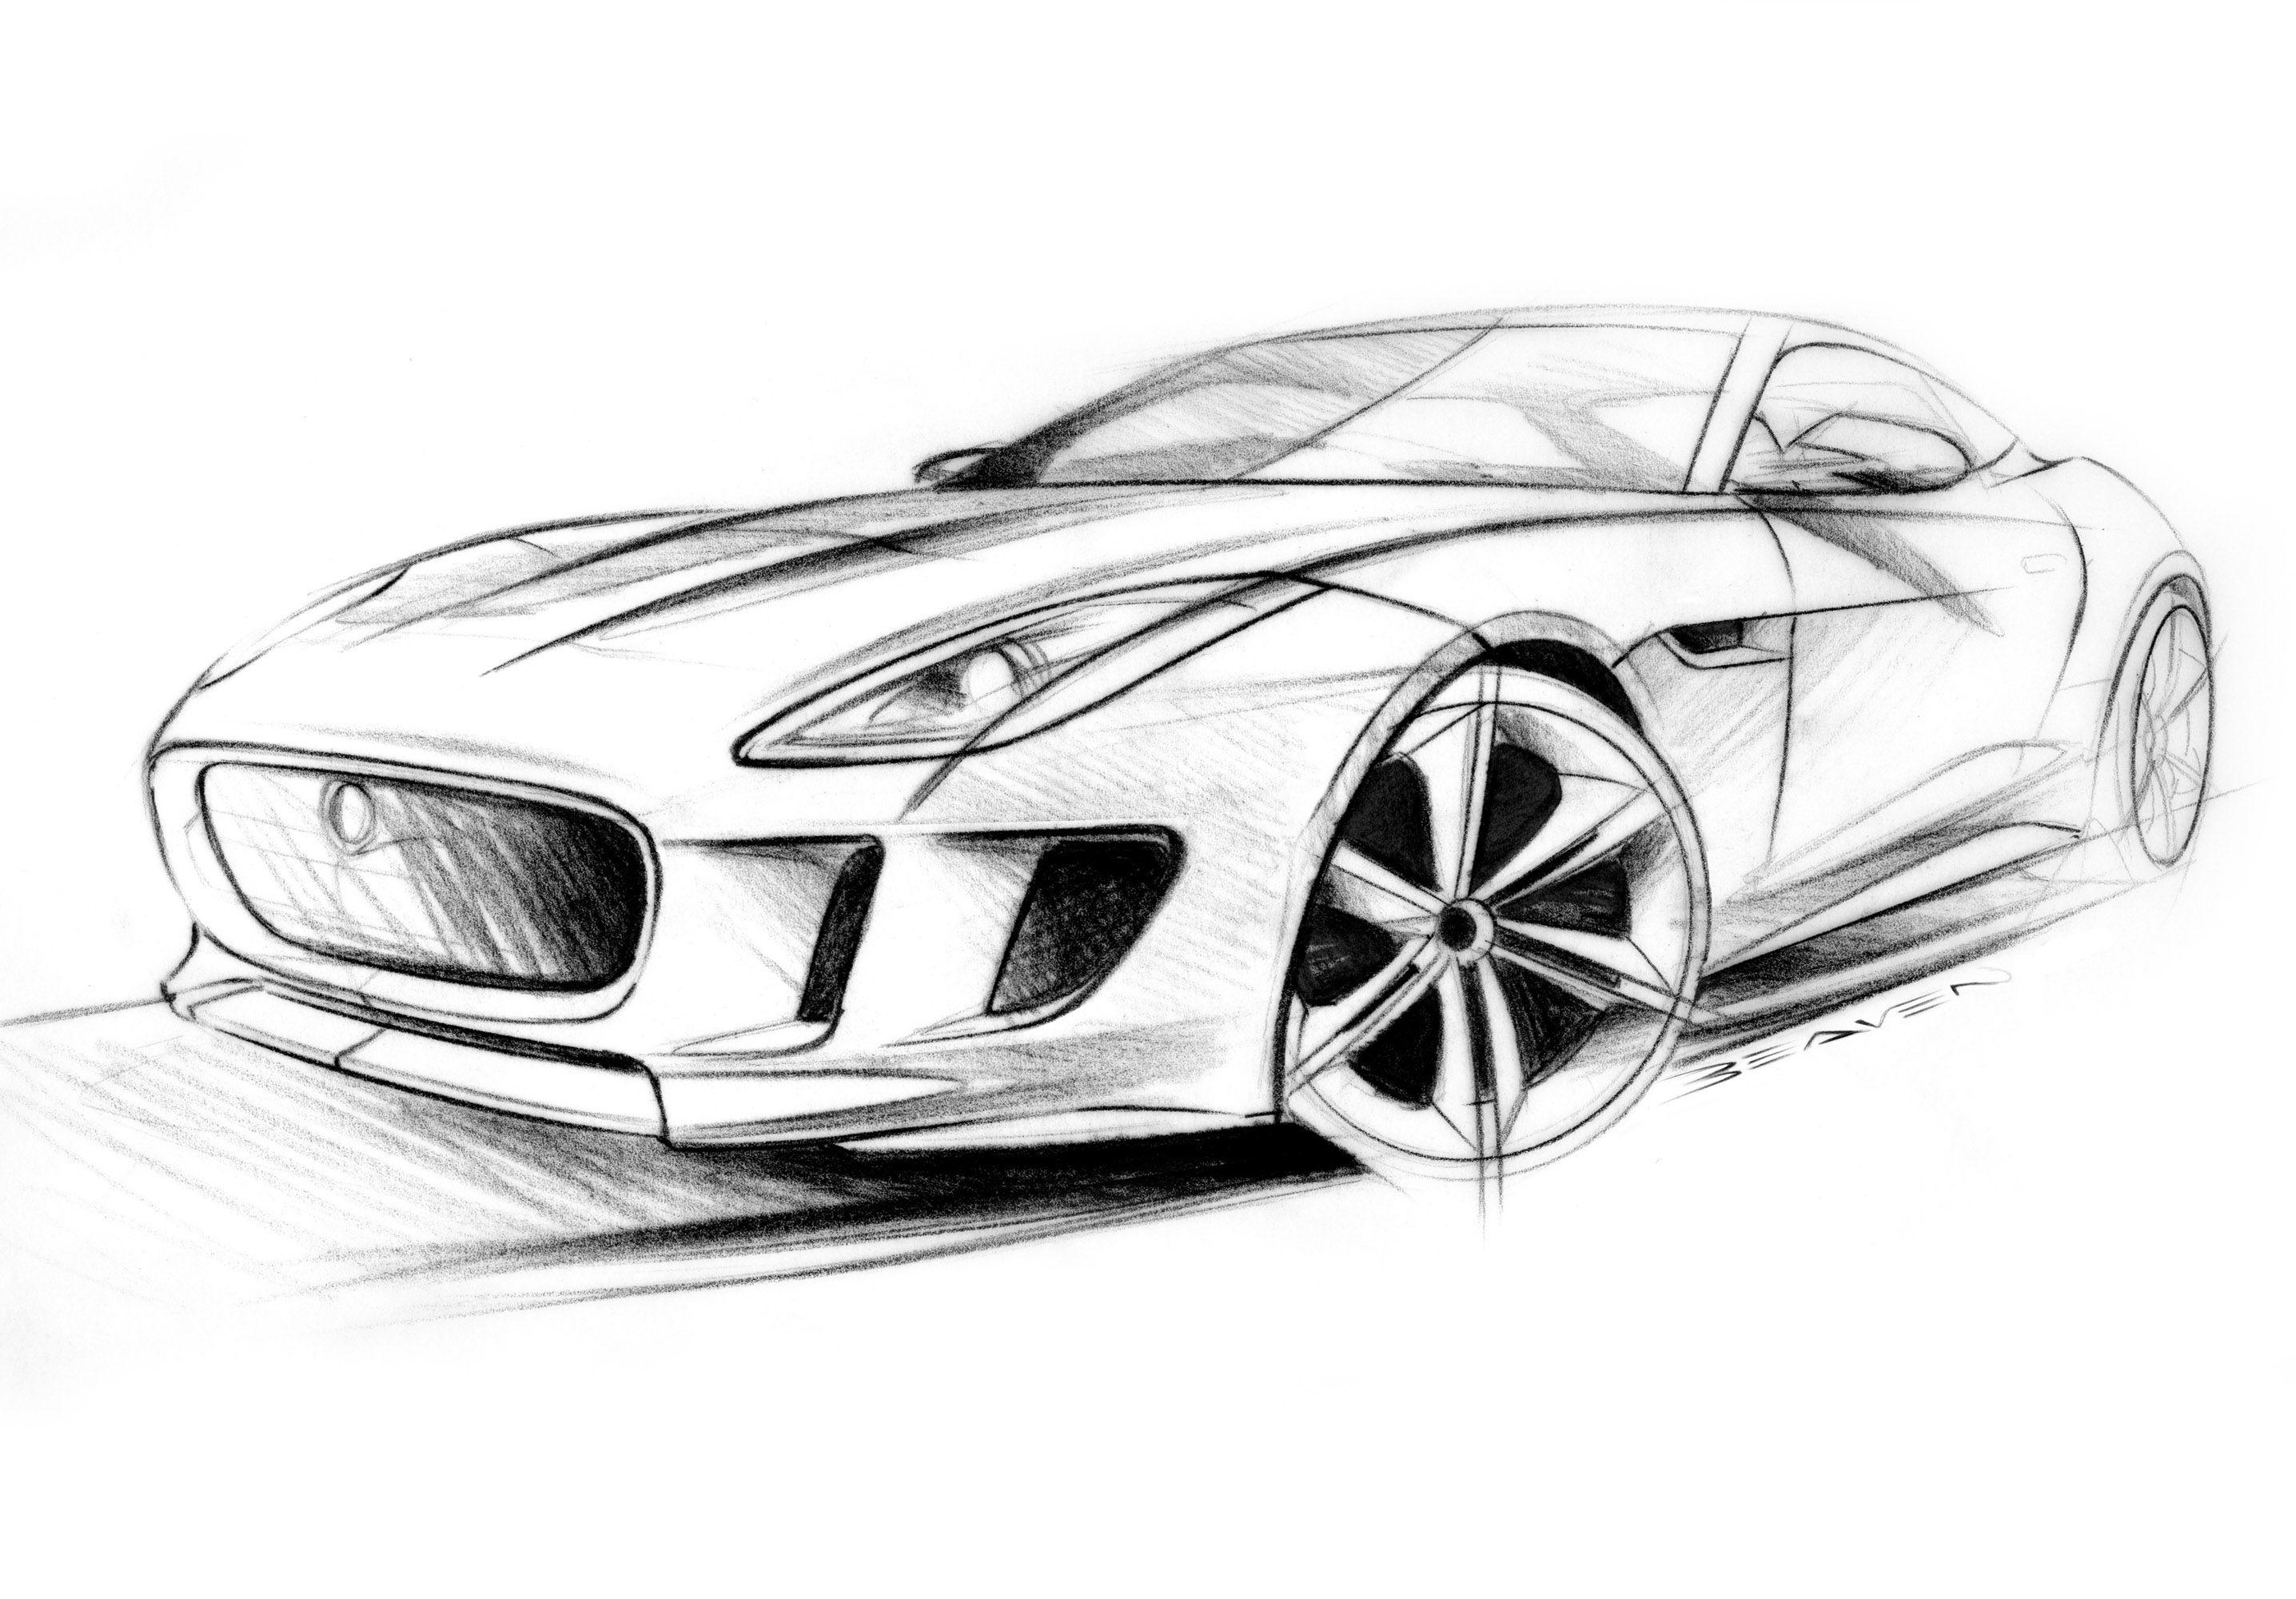 Nature Pencil Sketches Hd Wallpapers Fit Car Drawings Cool Car Drawings Hipster Drawings